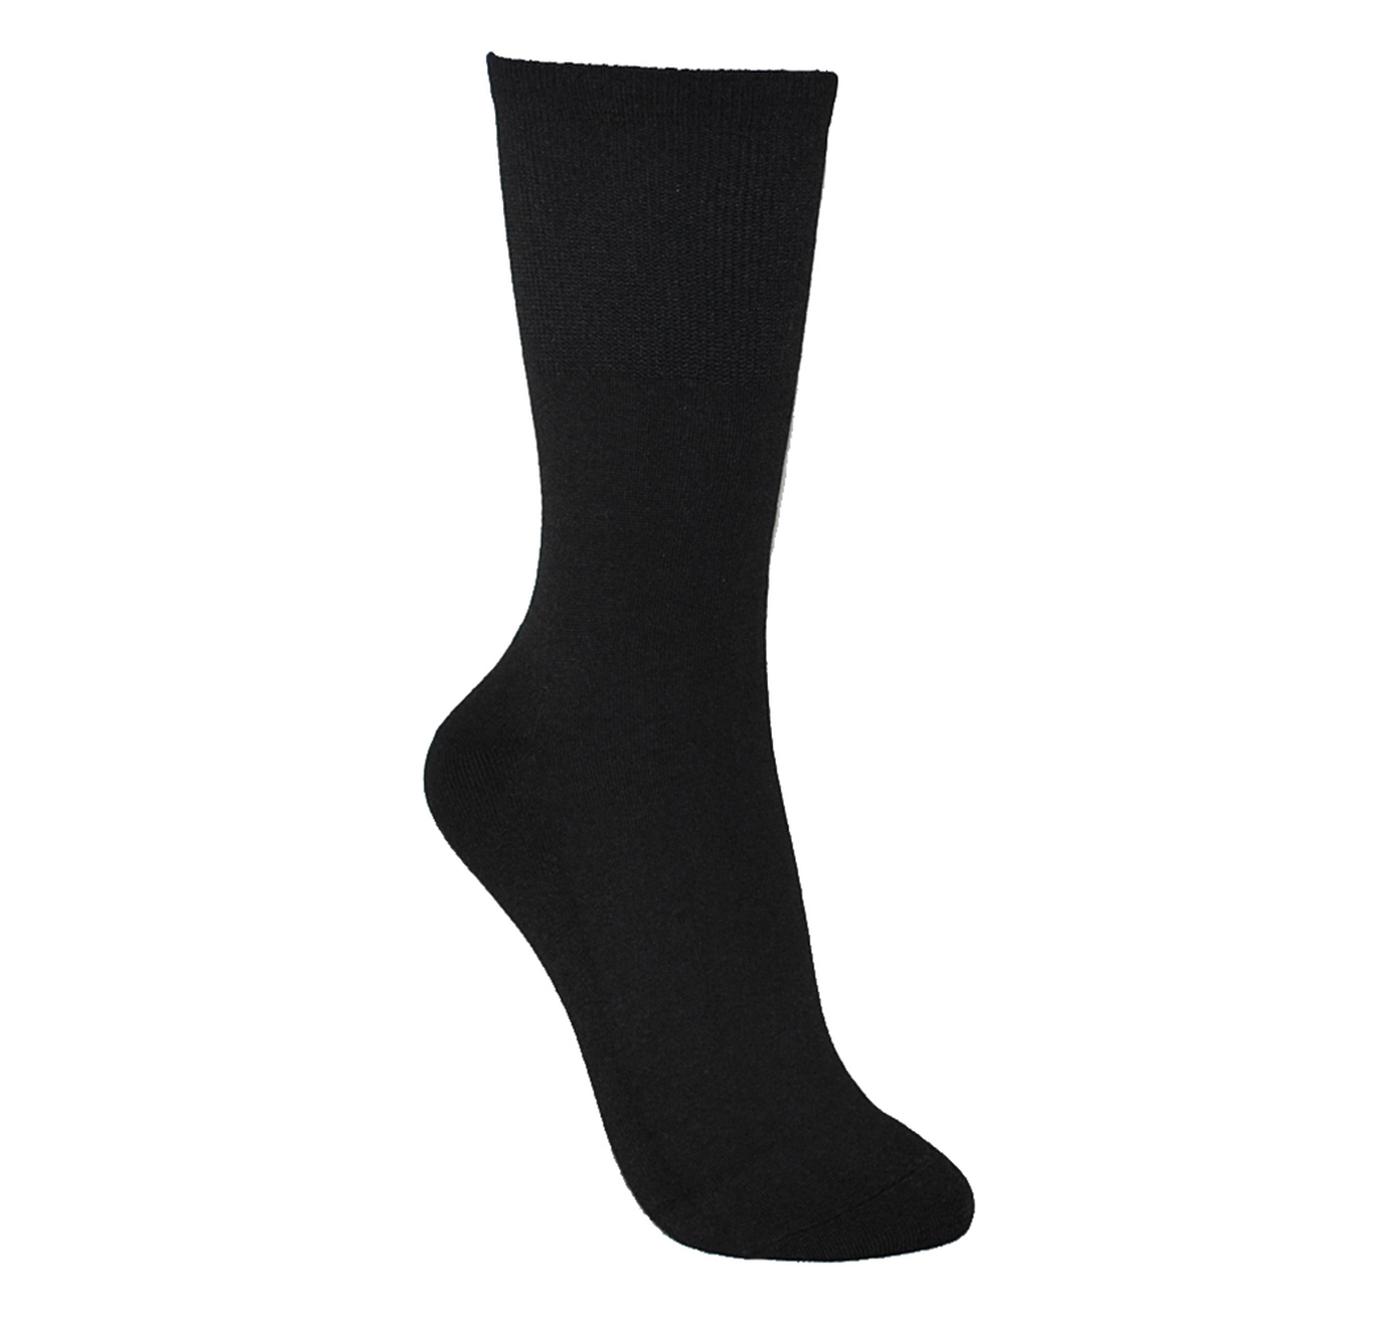 ECCO Womens Mid Cushion Sock